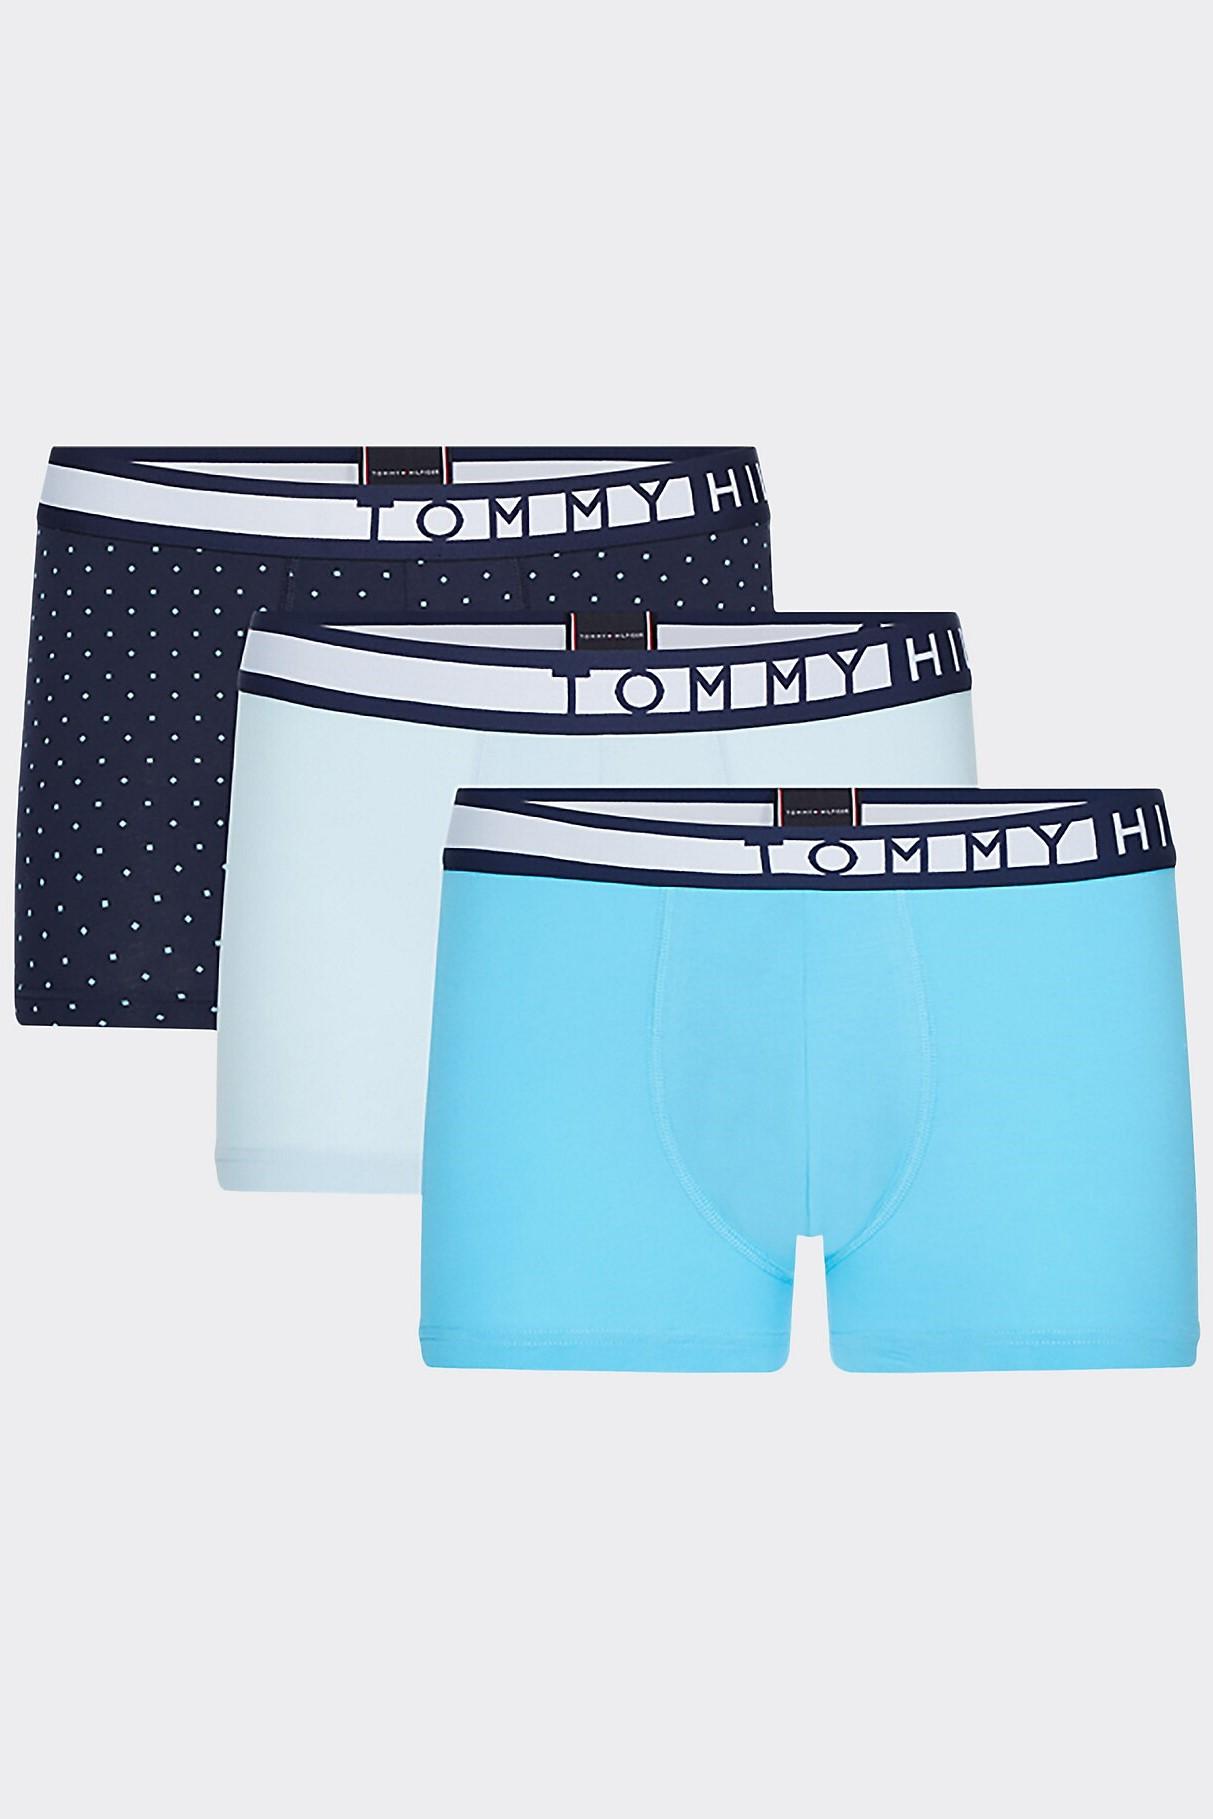 Tommy Hilfiger modrý 3 pack boxers 3P Trunk Print